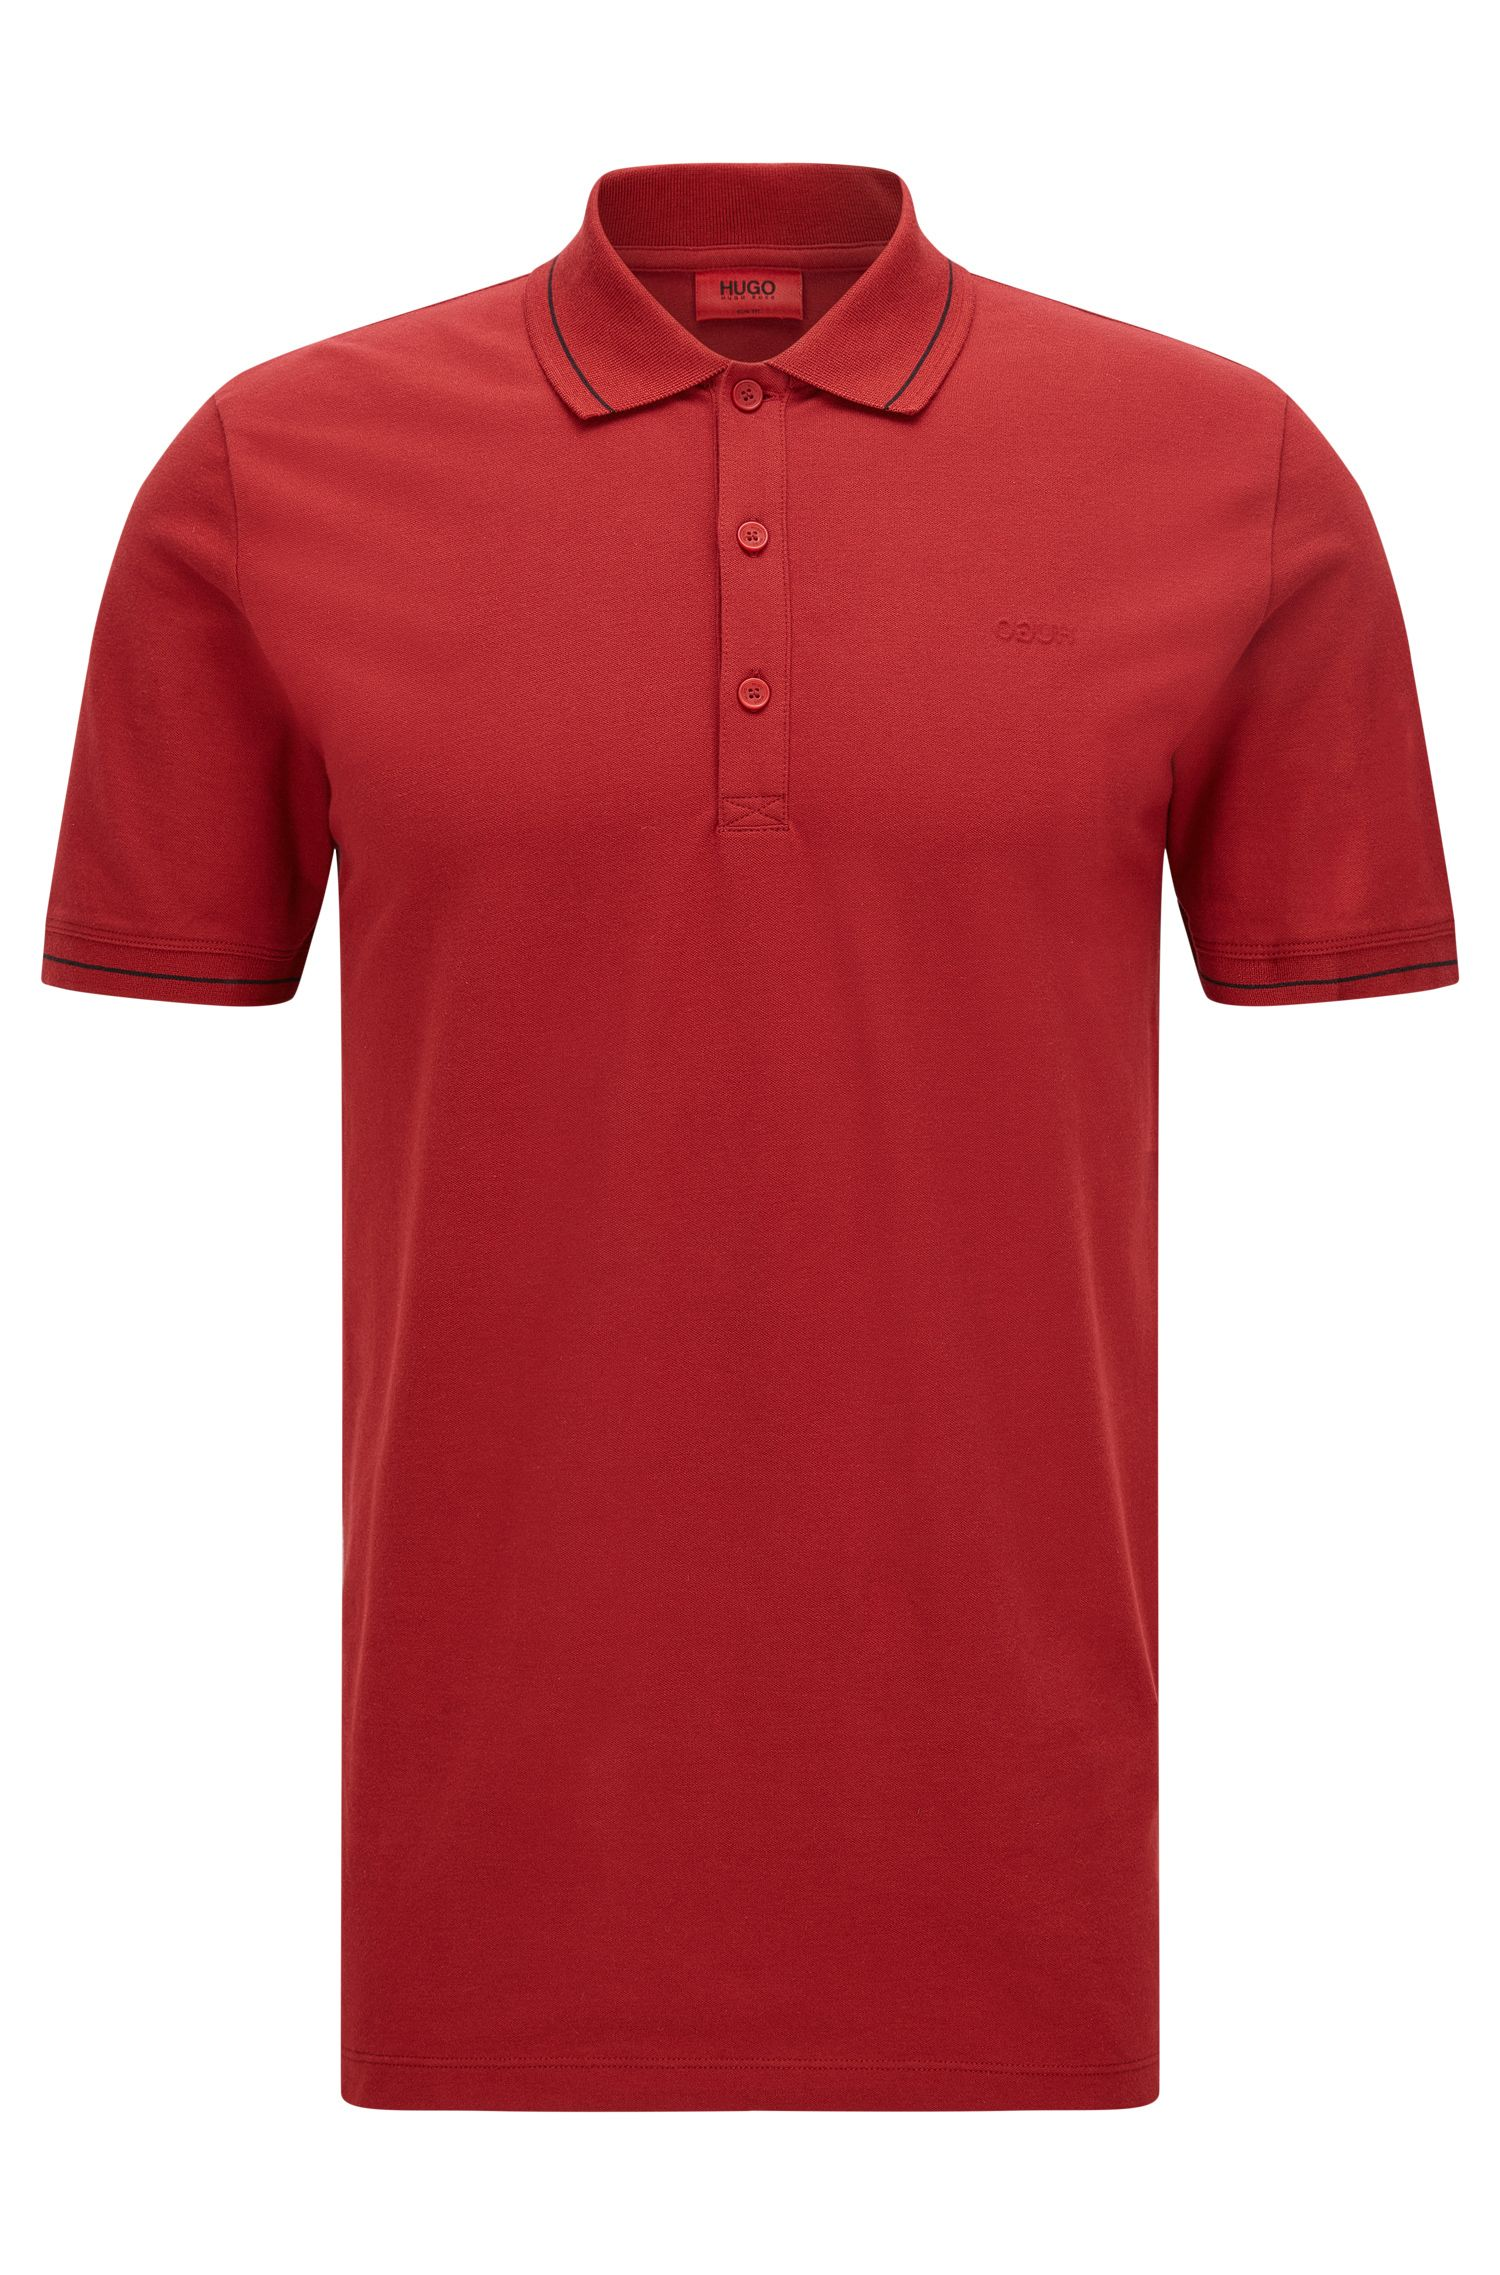 'Daymont'   Slim Fit, Stretch Cotton Polo